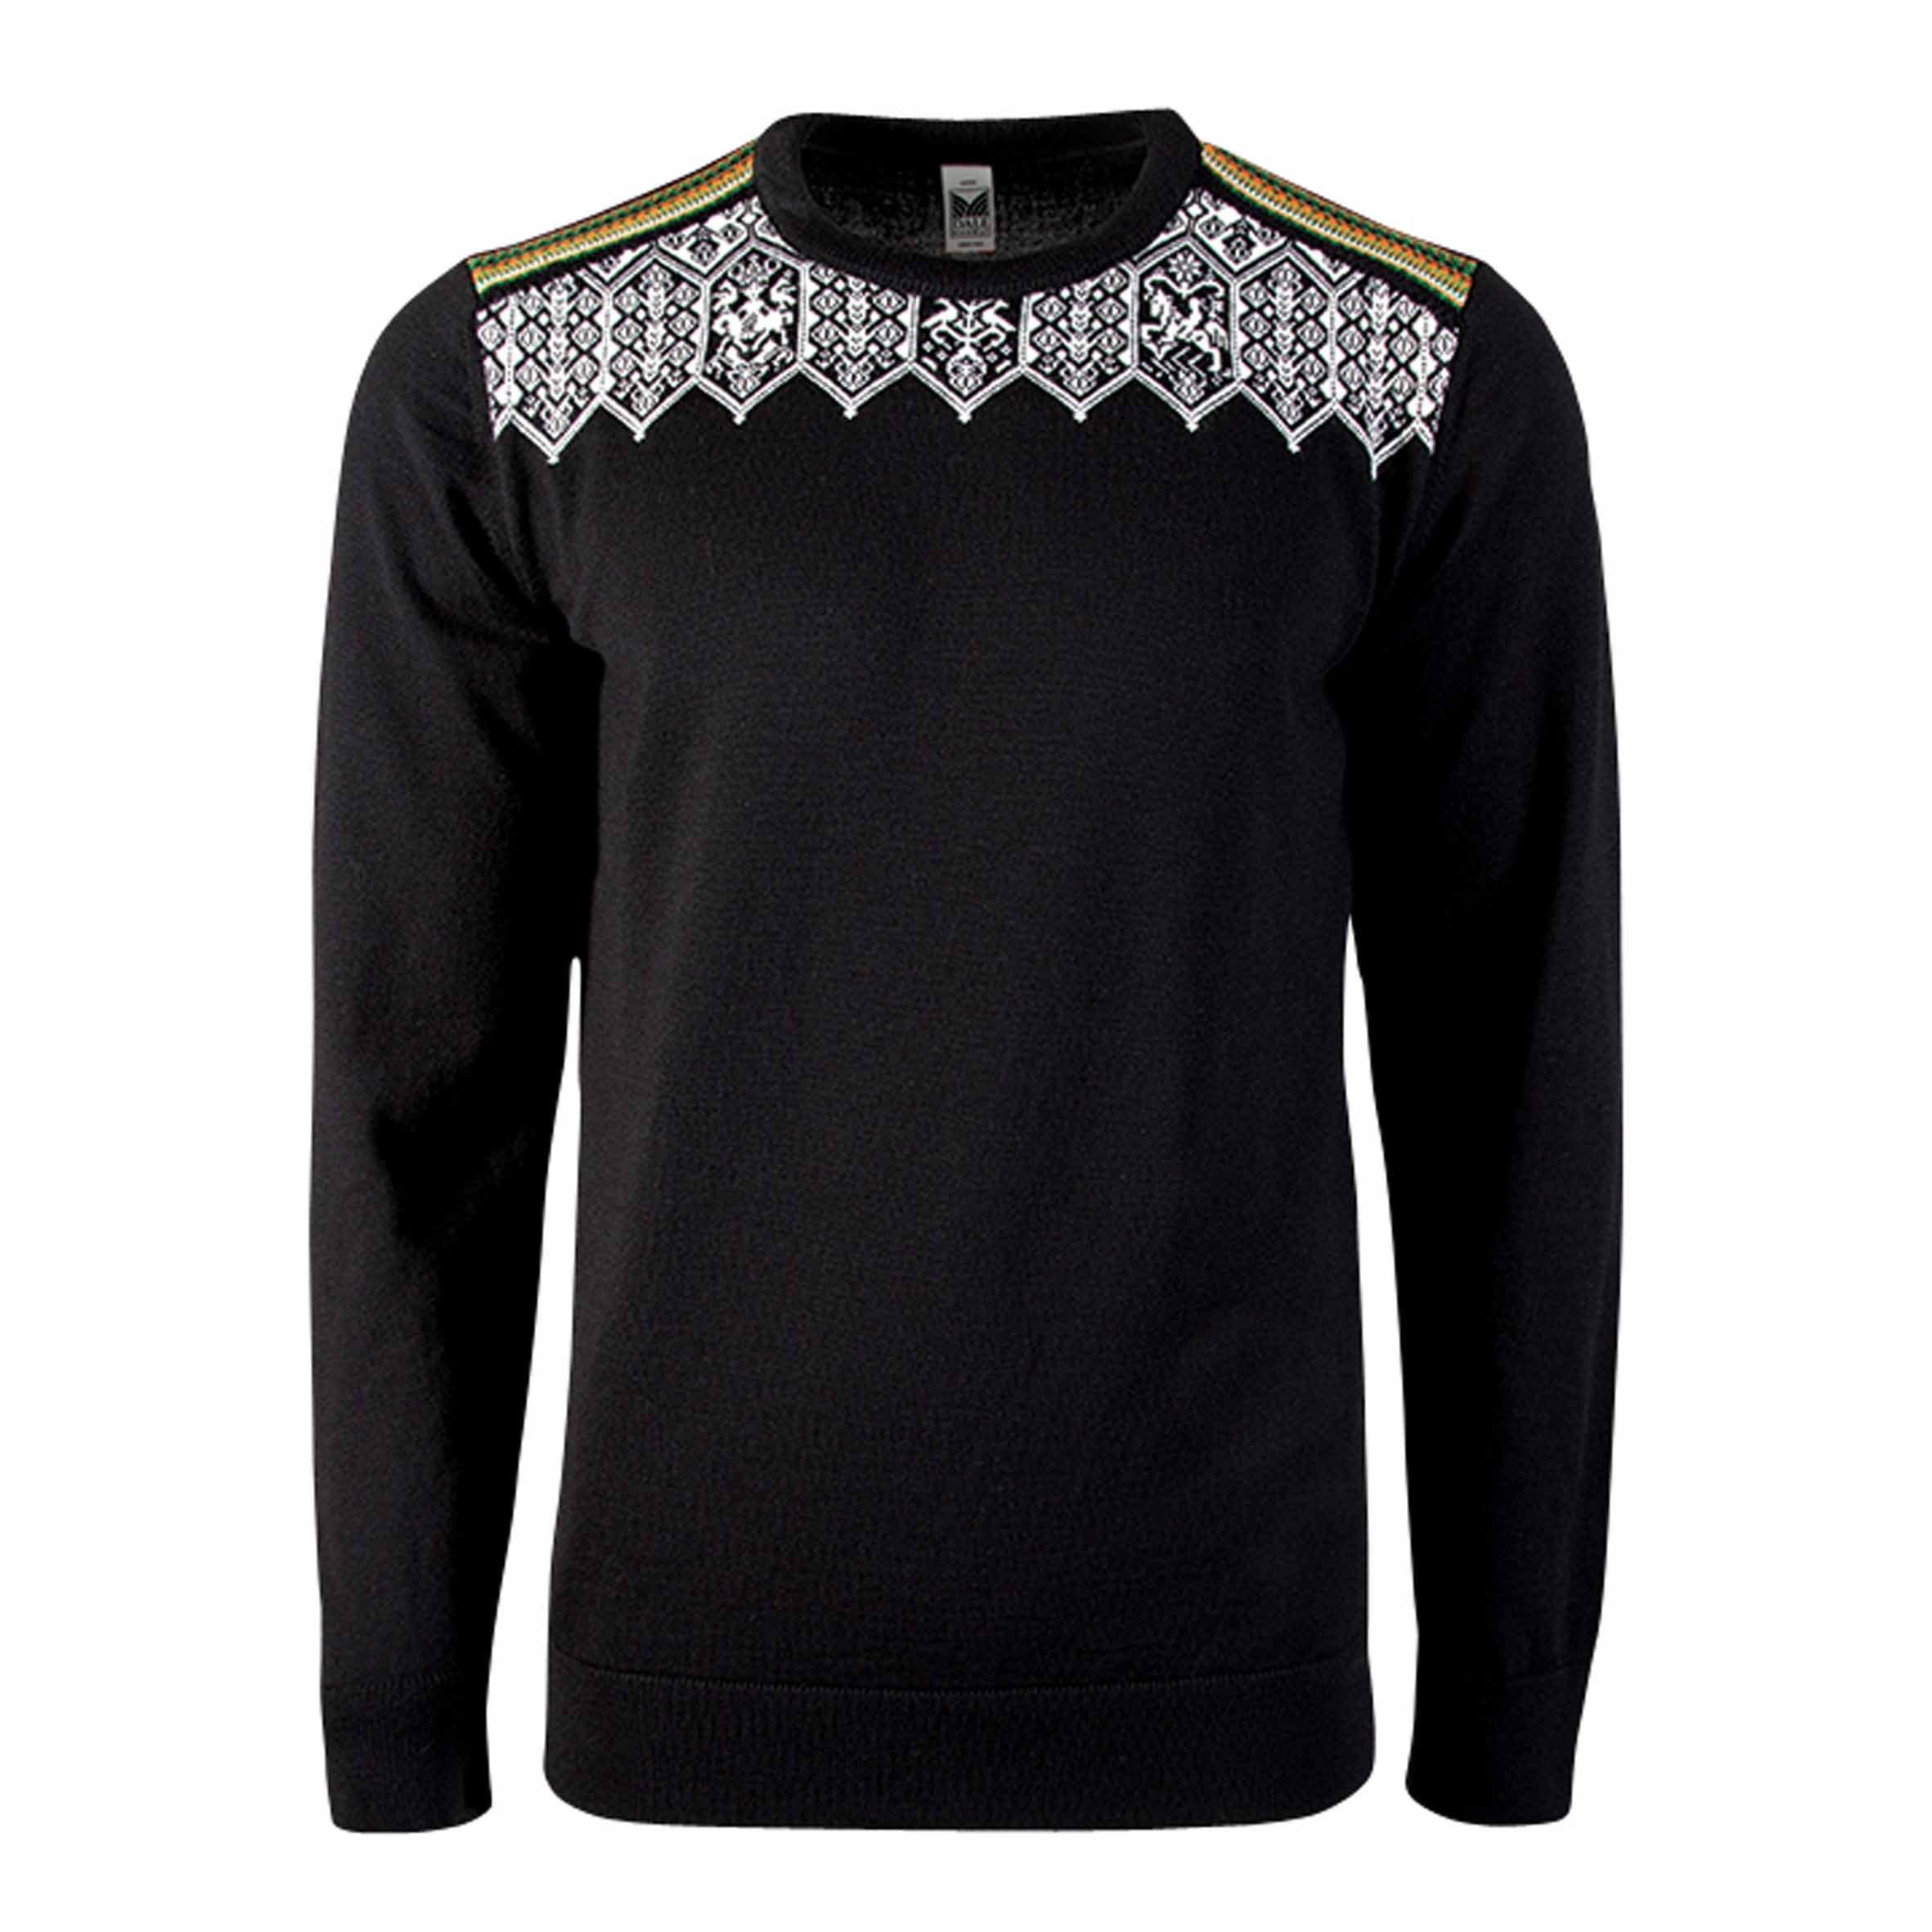 Dale of Norway Men's Lillehammer Masculine Sweater, Black/Orange Peel/Off White/Spring Green, Large